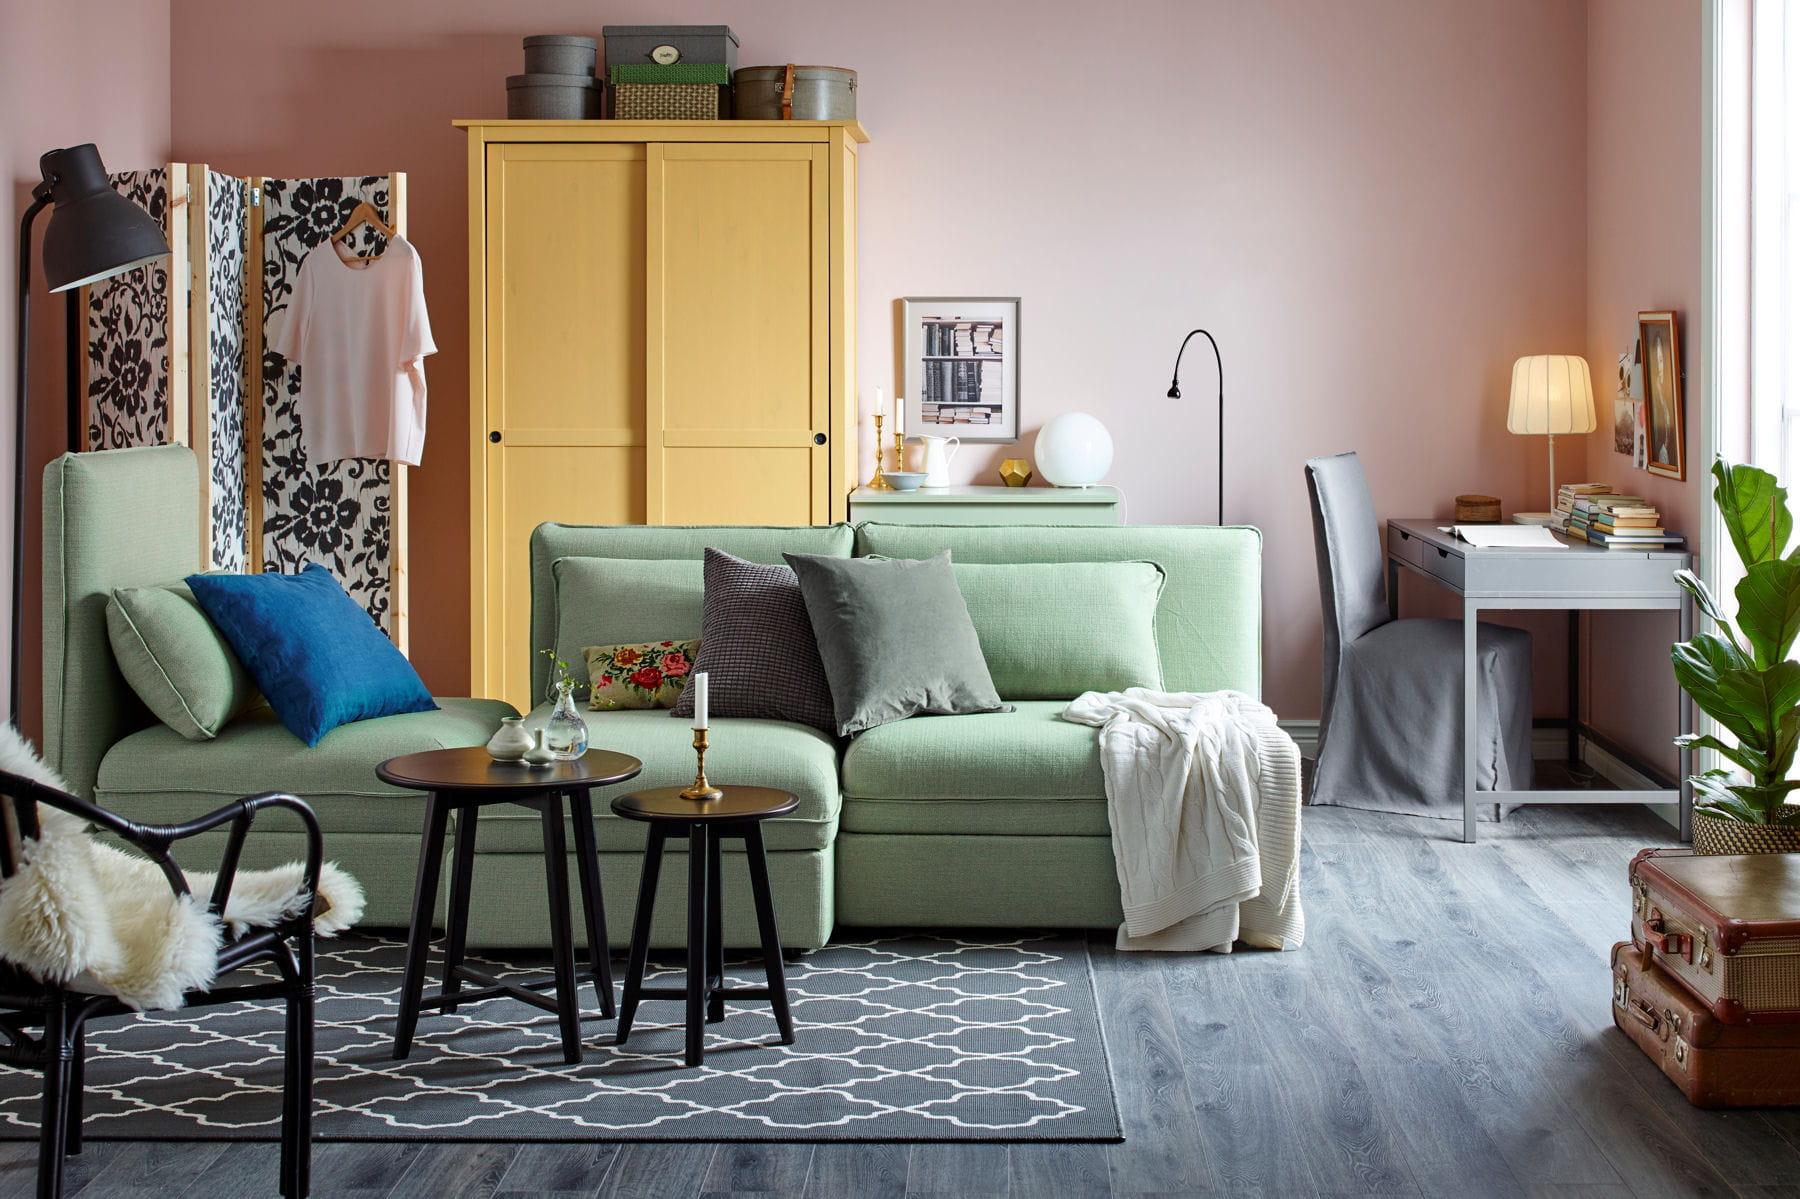 catalogue ikea 2017 date de sortie catalogue cuisine et. Black Bedroom Furniture Sets. Home Design Ideas